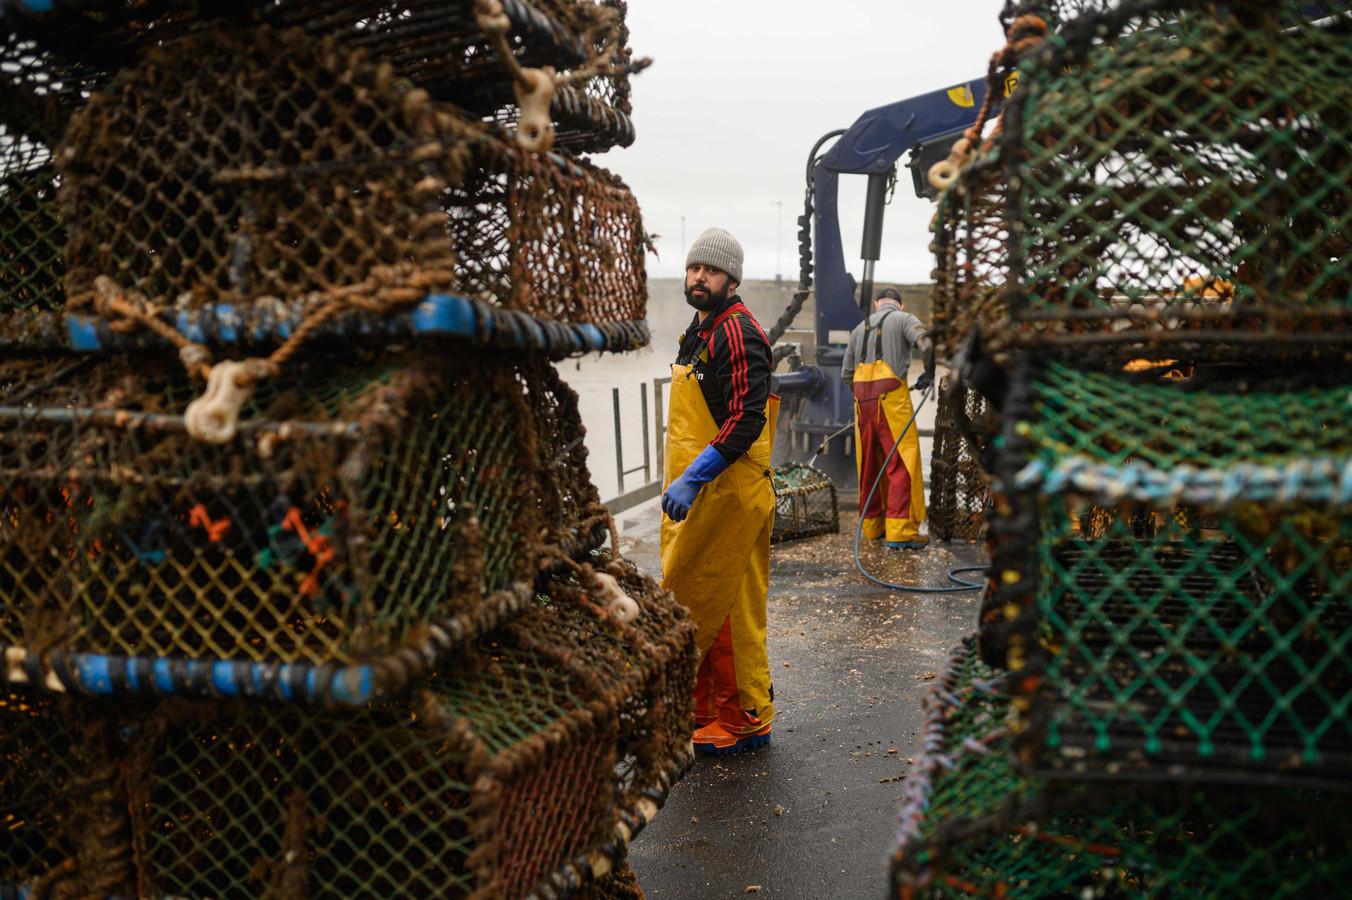 Britse vissers in de haven van Bridlington, Engeland.